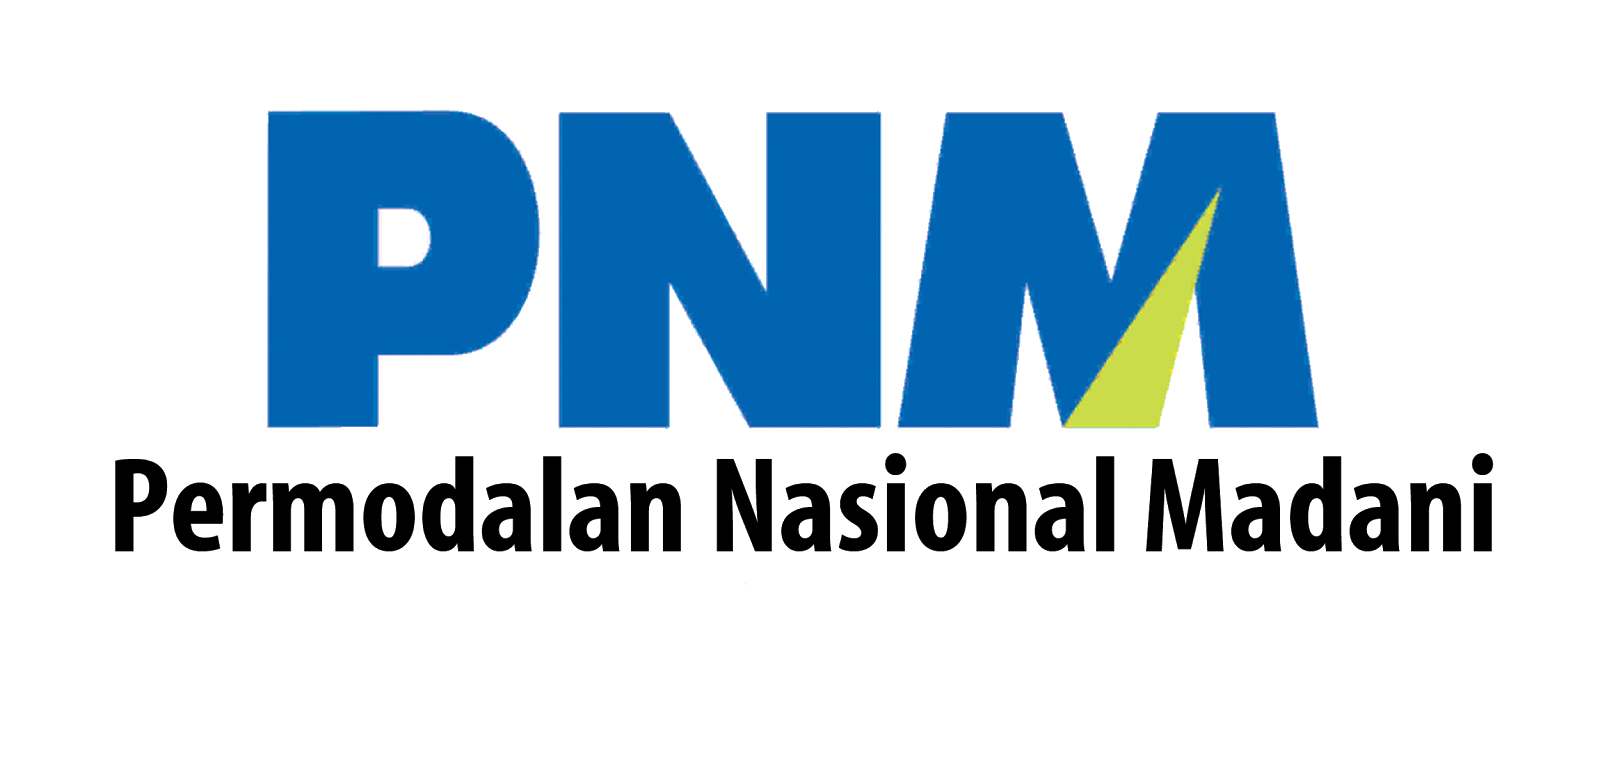 OPEN Kerja PT. Permodalan Nasional Madani (Persero)